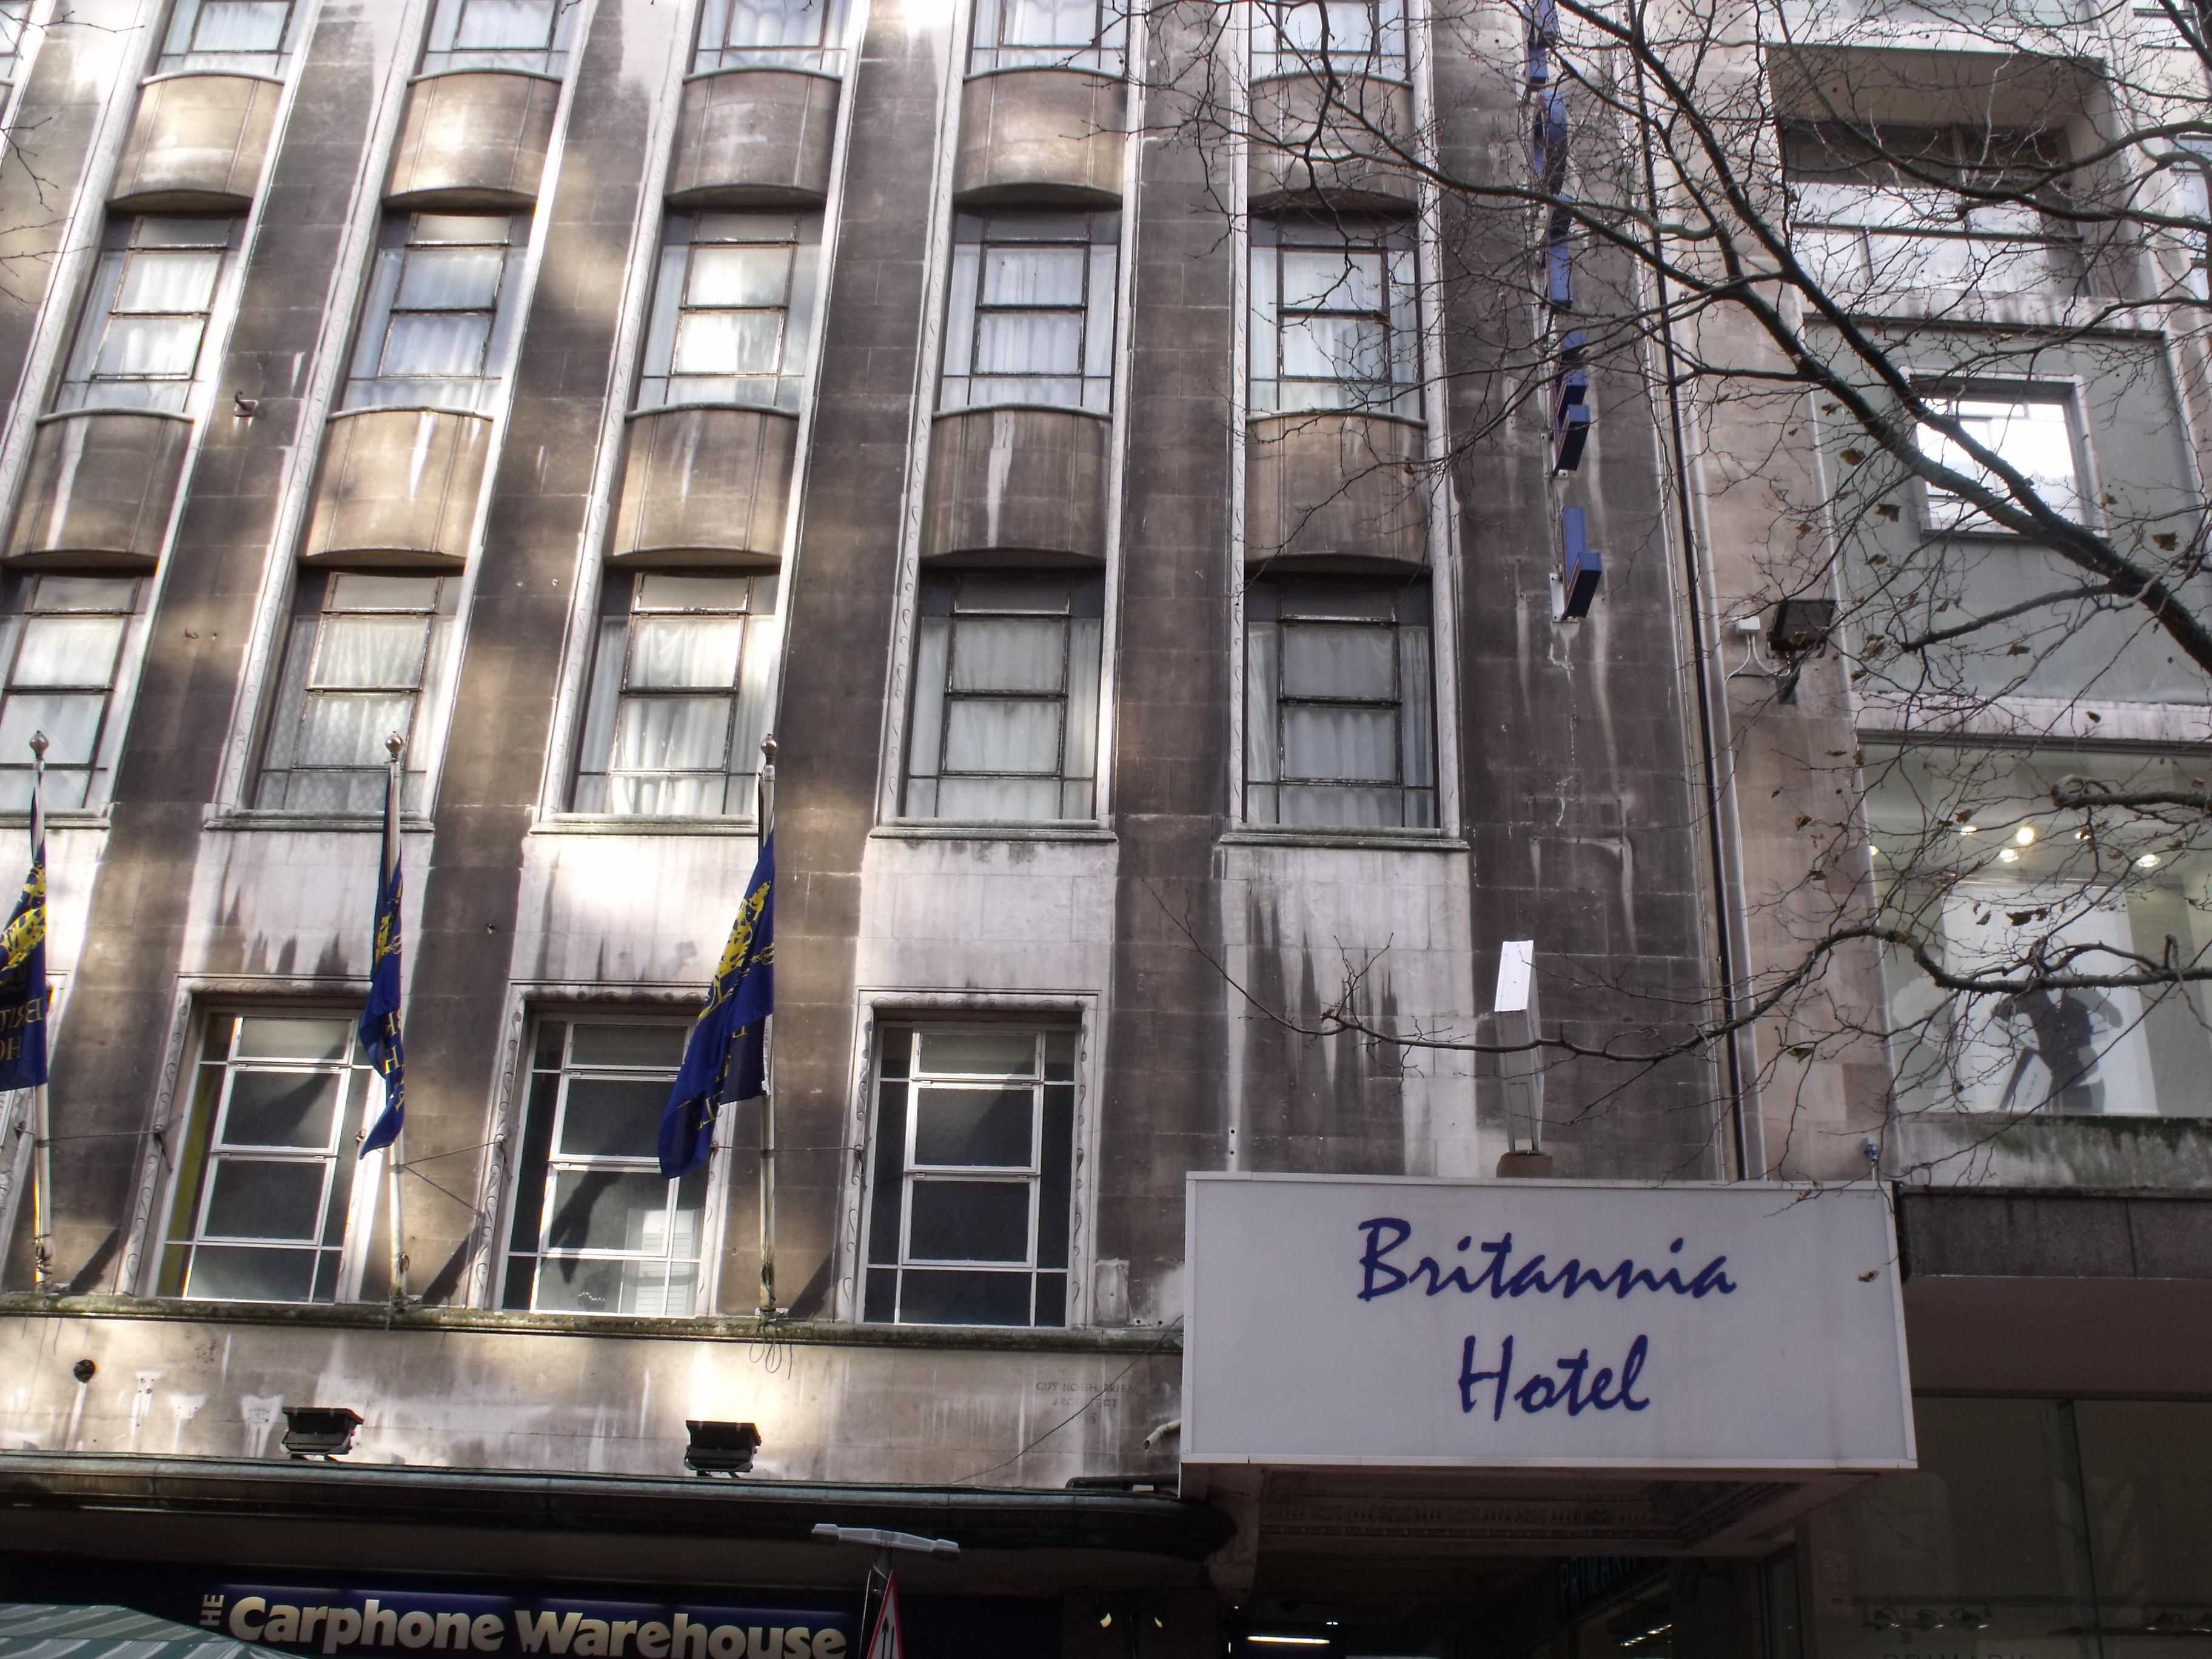 Britannia Hotel Birmingham New Street Station